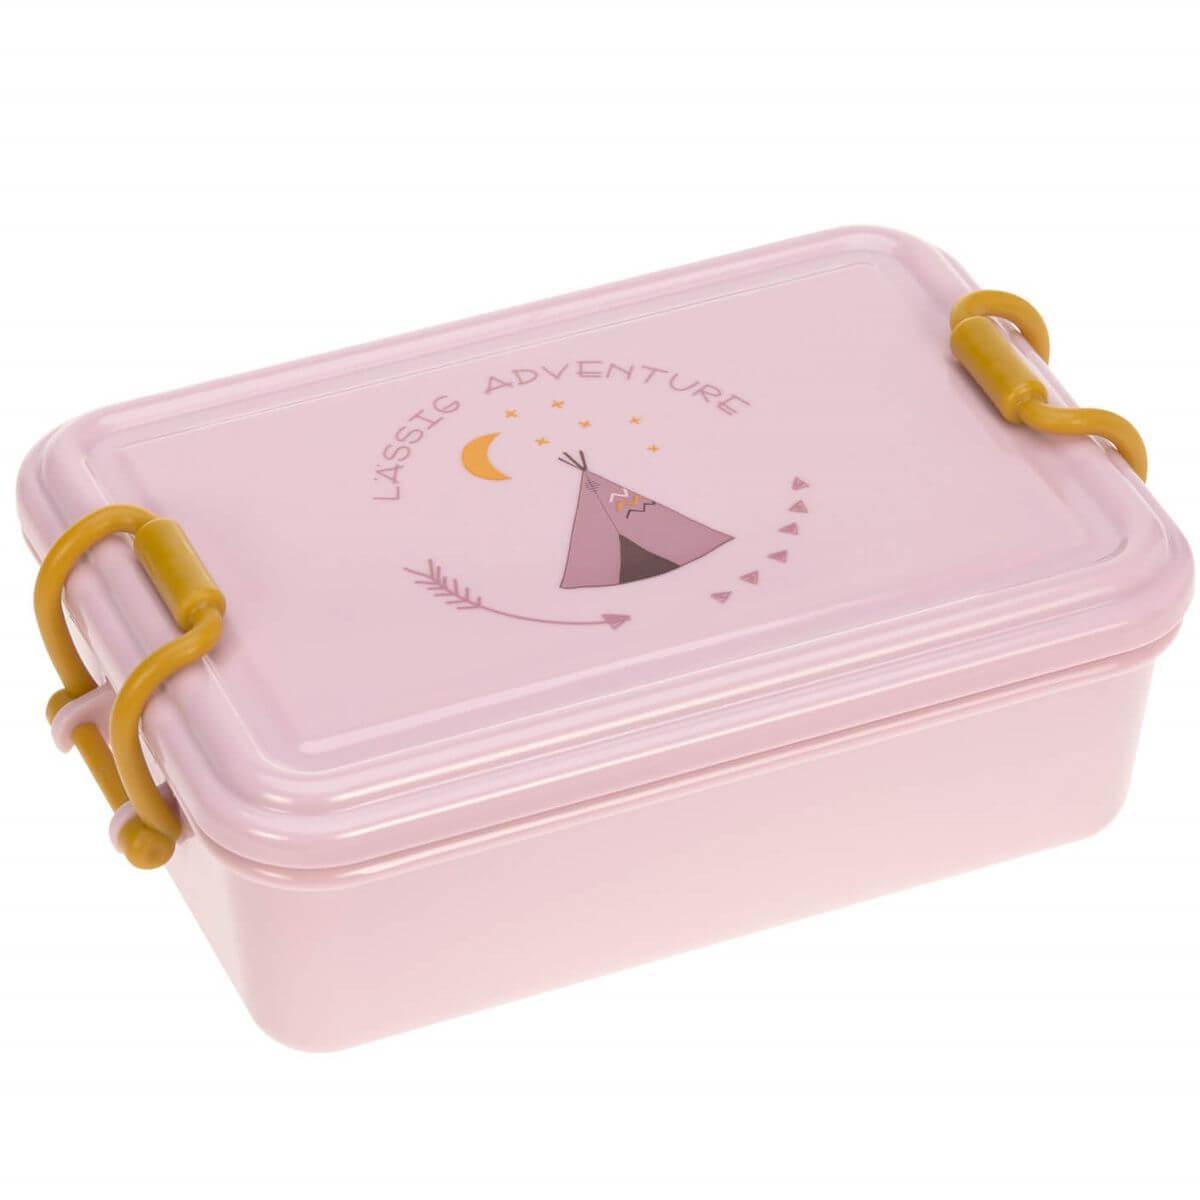 Lunchbox ADVENTURE TIPI Laessig